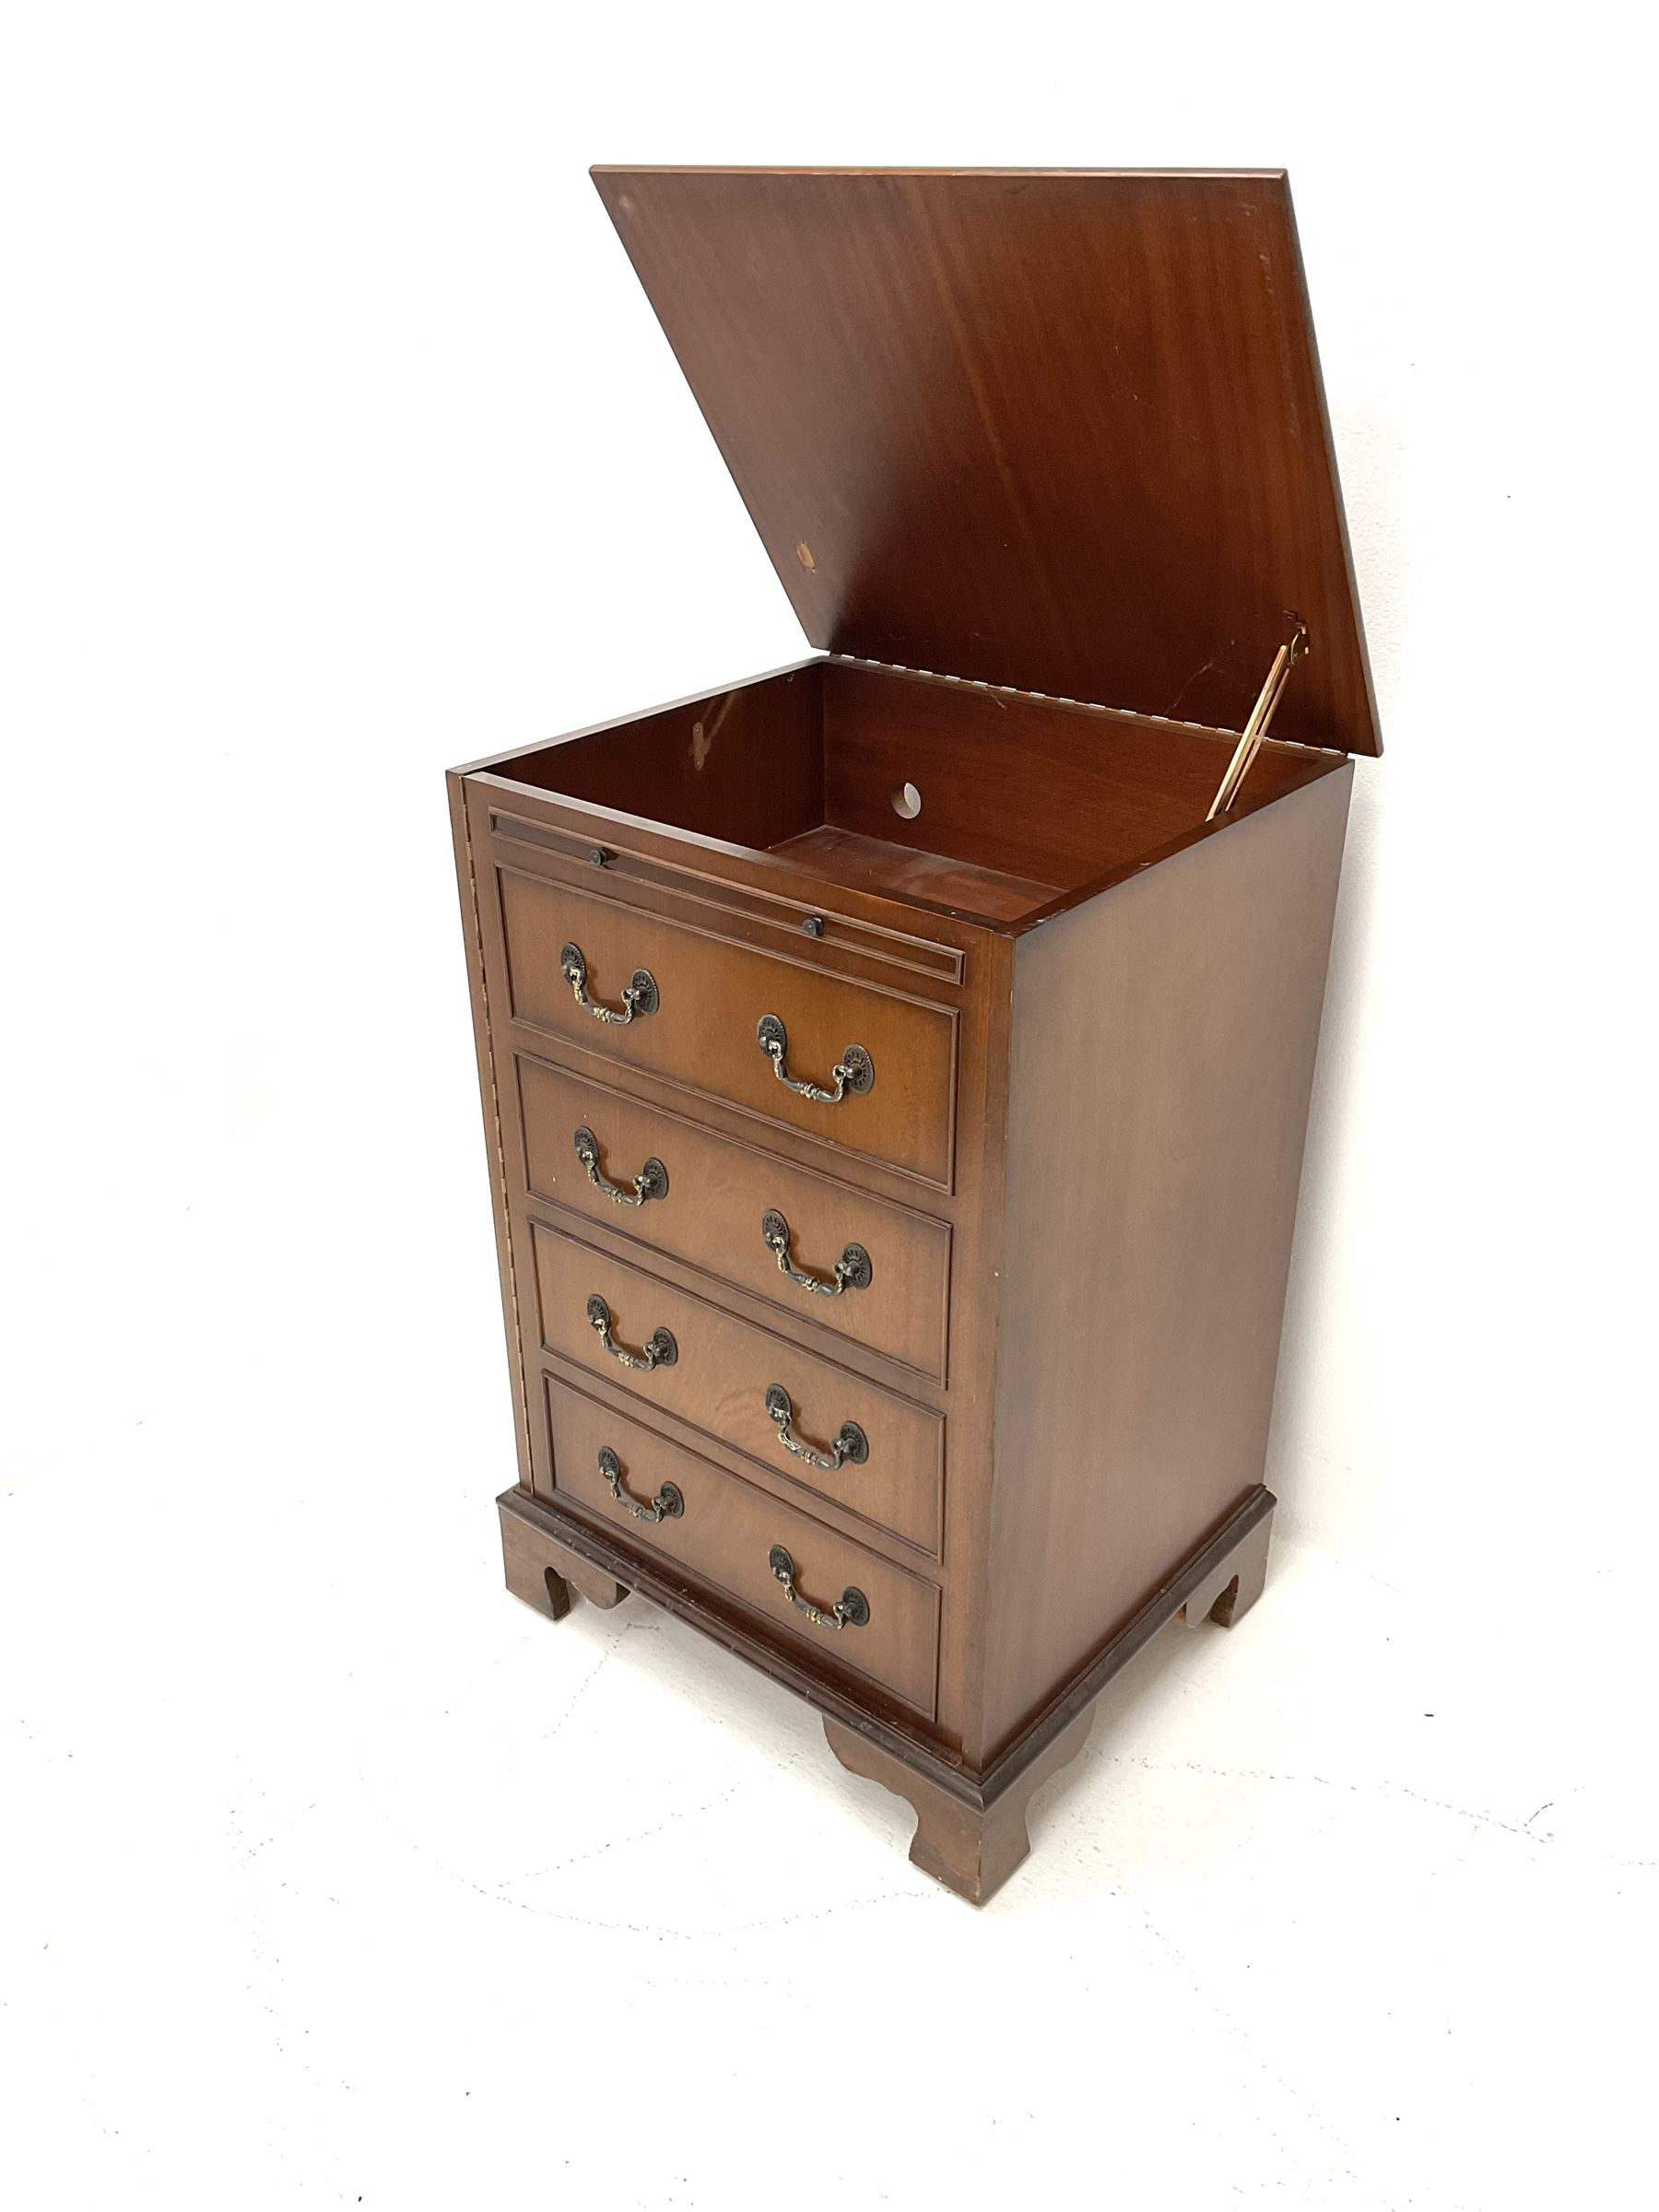 Georgian style mahogany music cabinet - Image 2 of 3